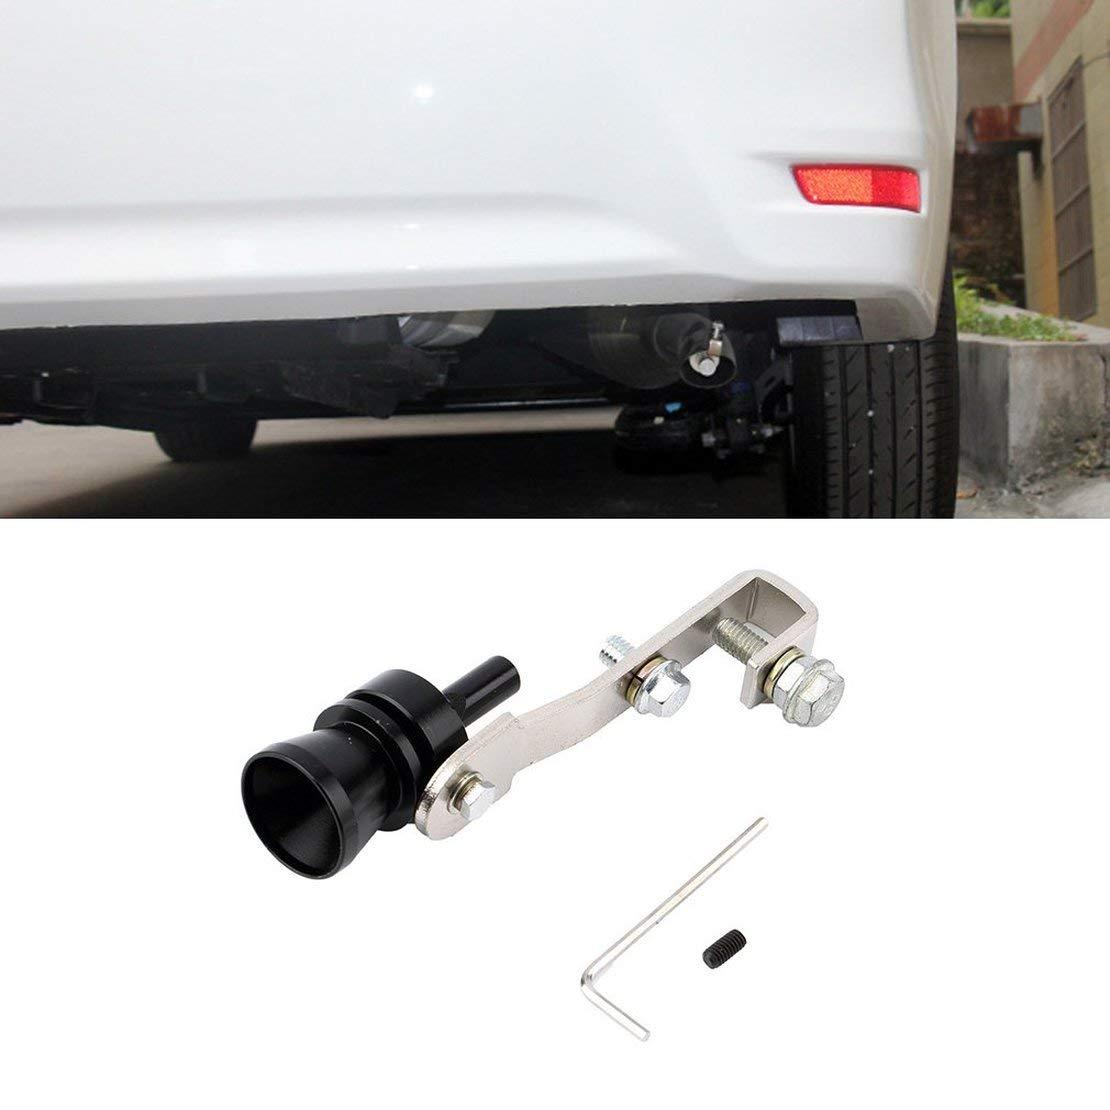 Automóviles de aluminio universales Auto BOV Turbo Sonido Whistle Tube Sound Simulator Tubo de escape silenciador Tubo de tubo: Amazon.es: Coche y moto